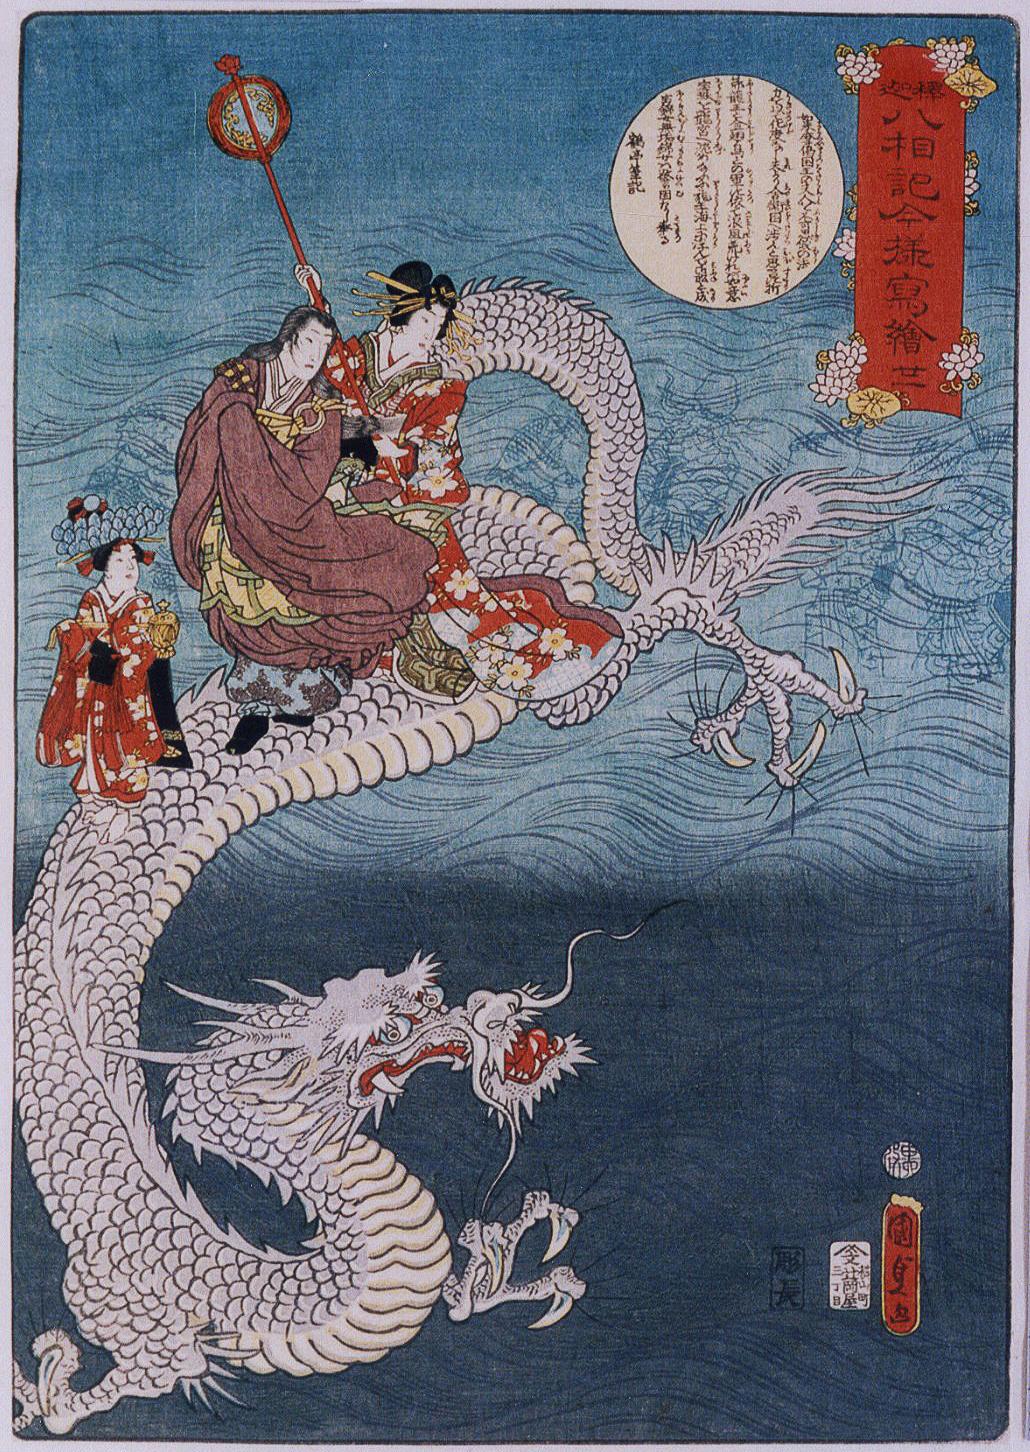 「釈迦八相記今様写絵」 二代目歌川国貞(Wikipediaより)